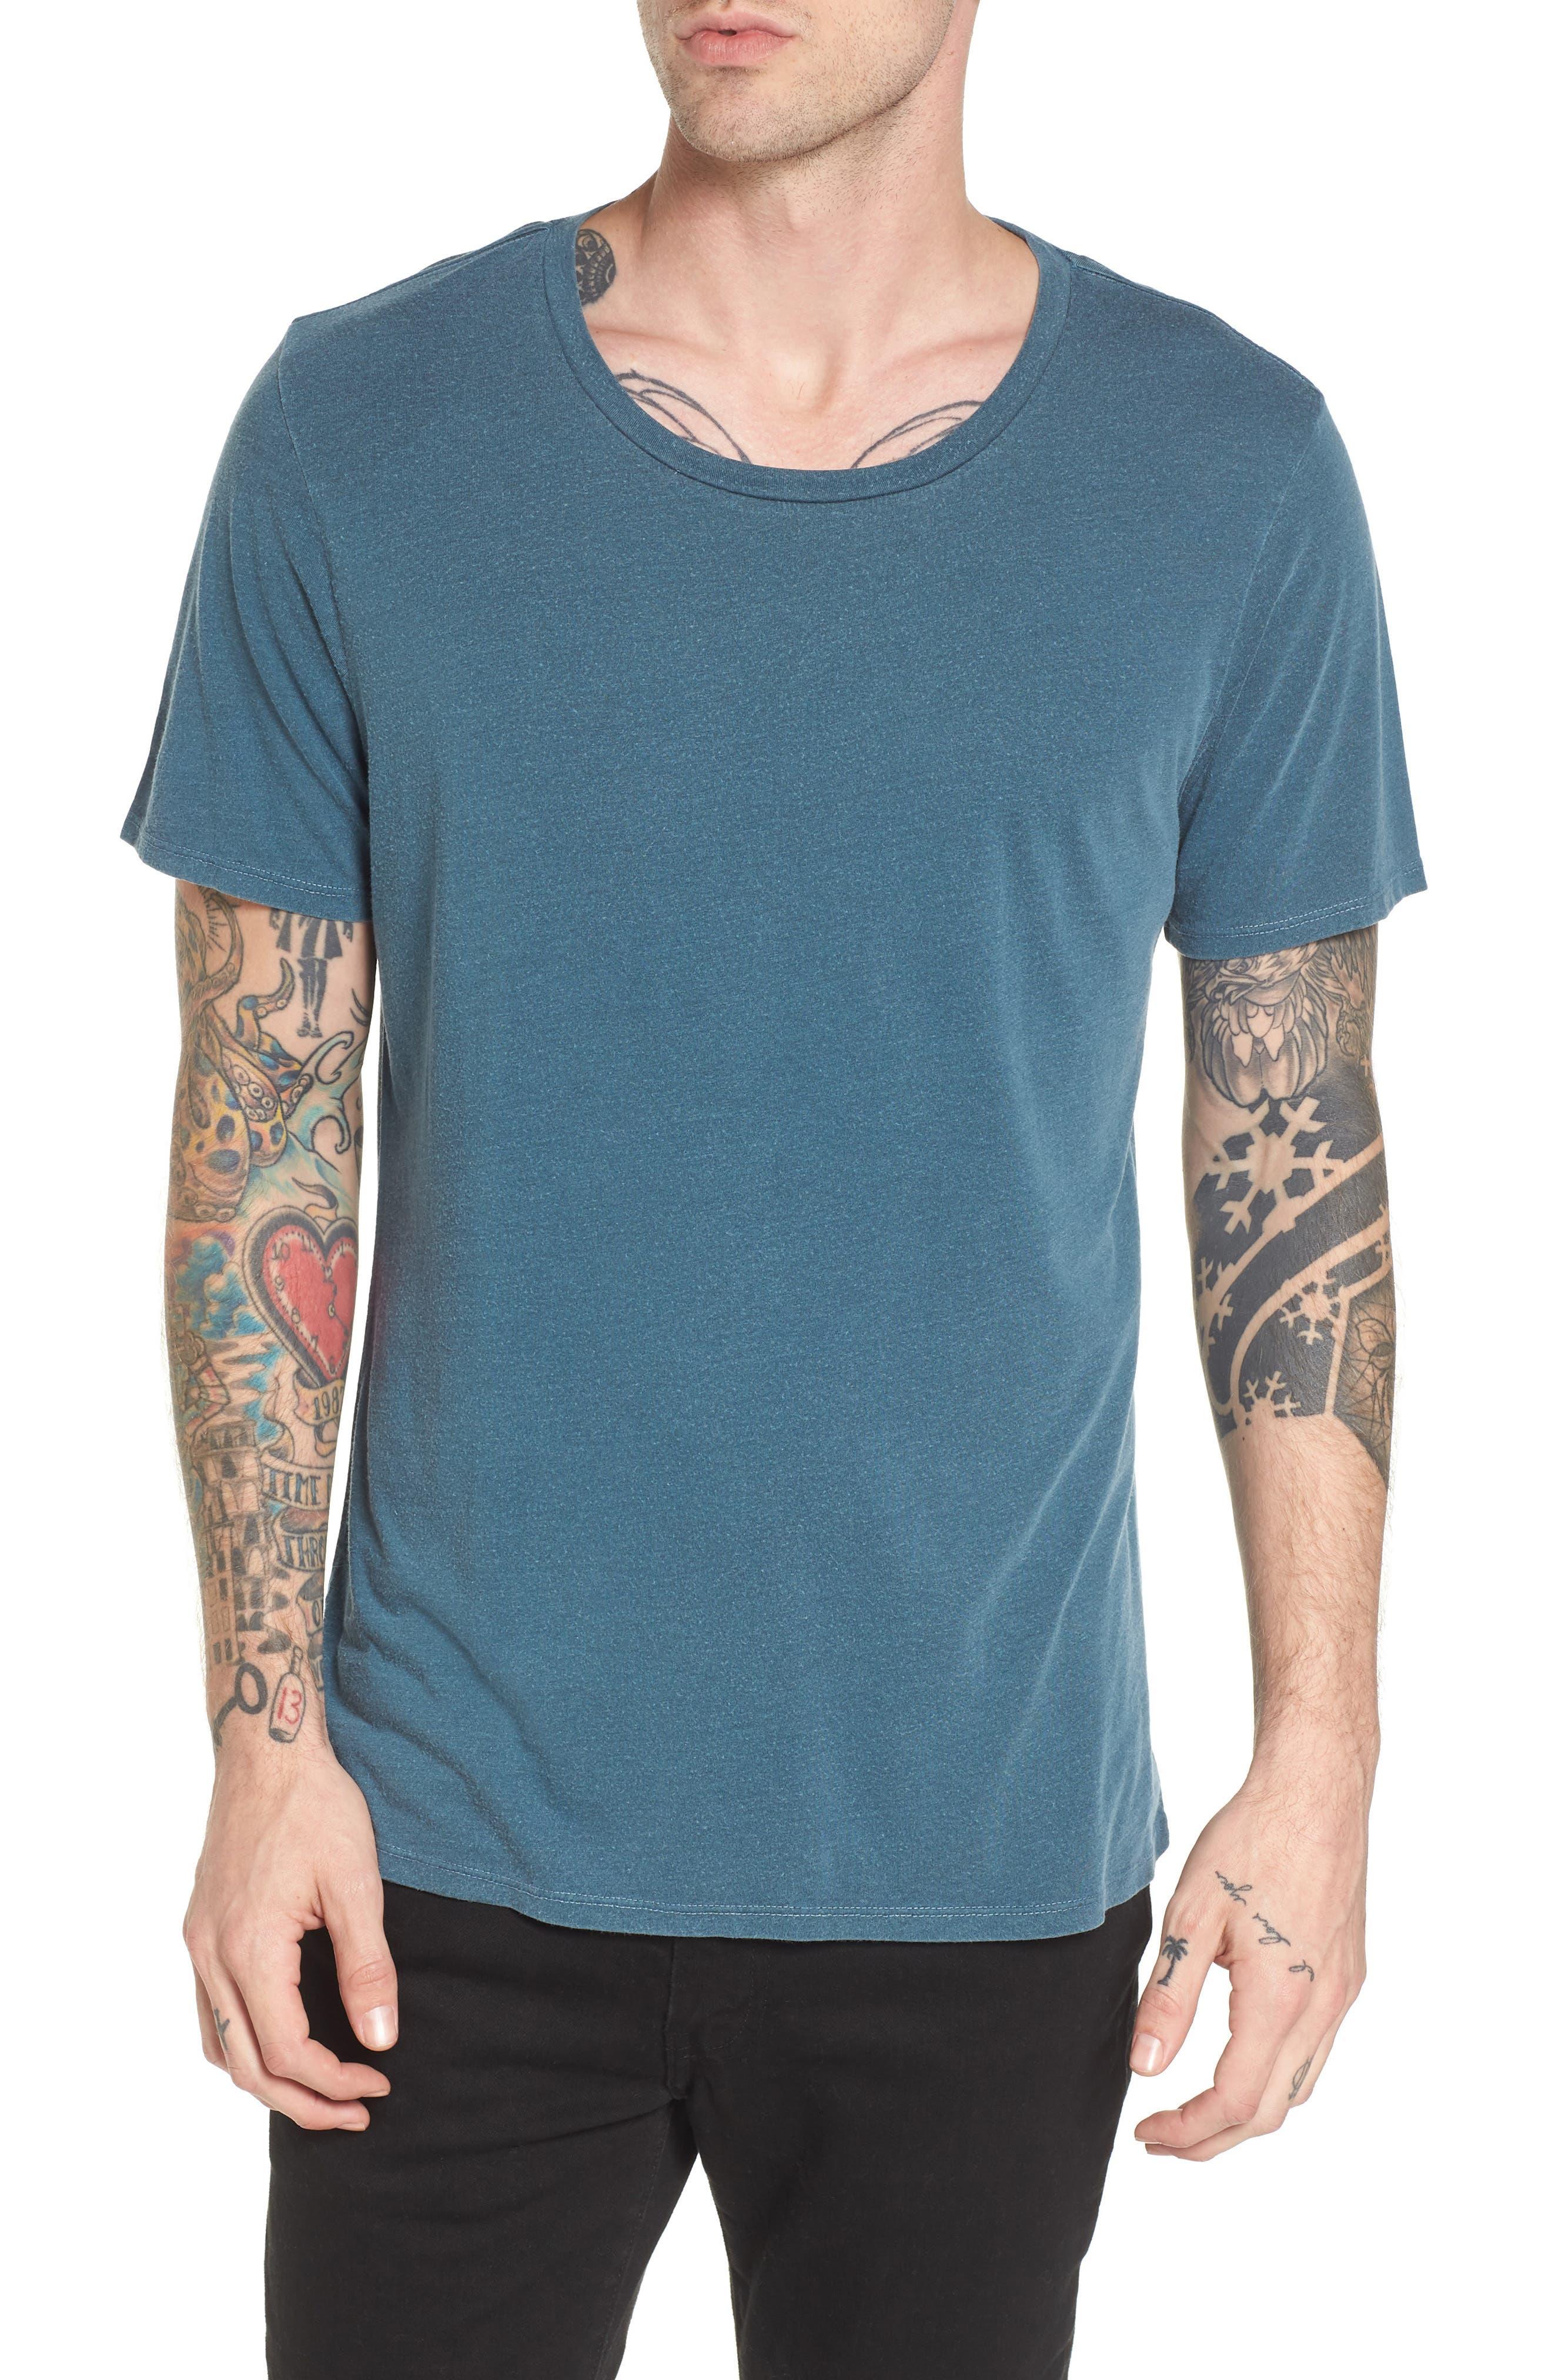 Main Image - The Rail Slim Fit Scoop Neck T-Shirt